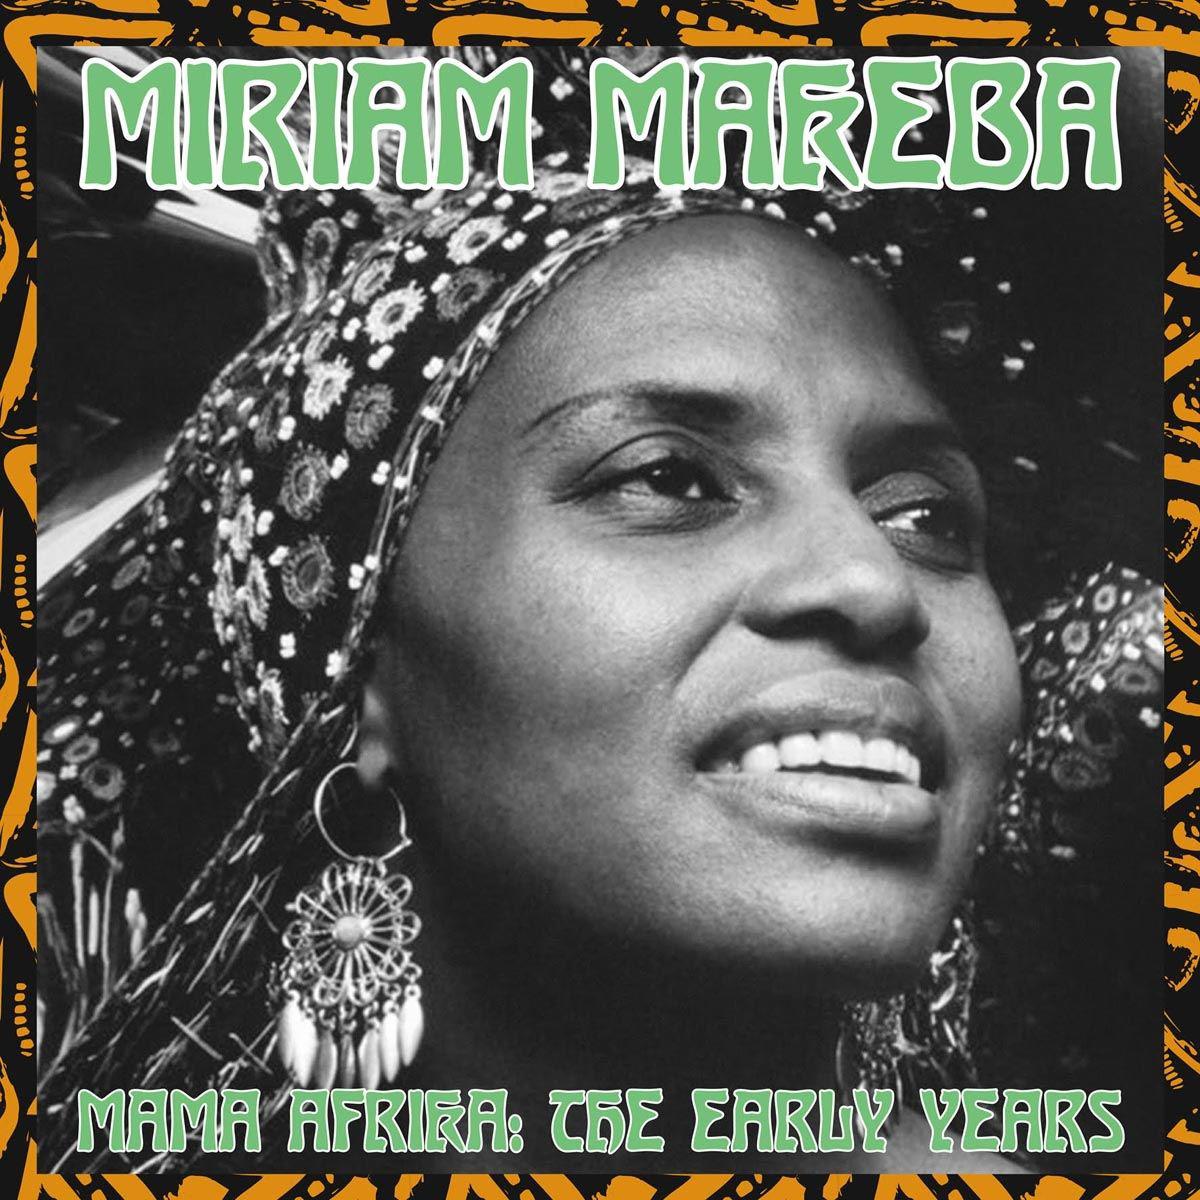 лучшая цена Мириам Макеба Miriam Makeba. Mama Afrika. The Early Years (LP)